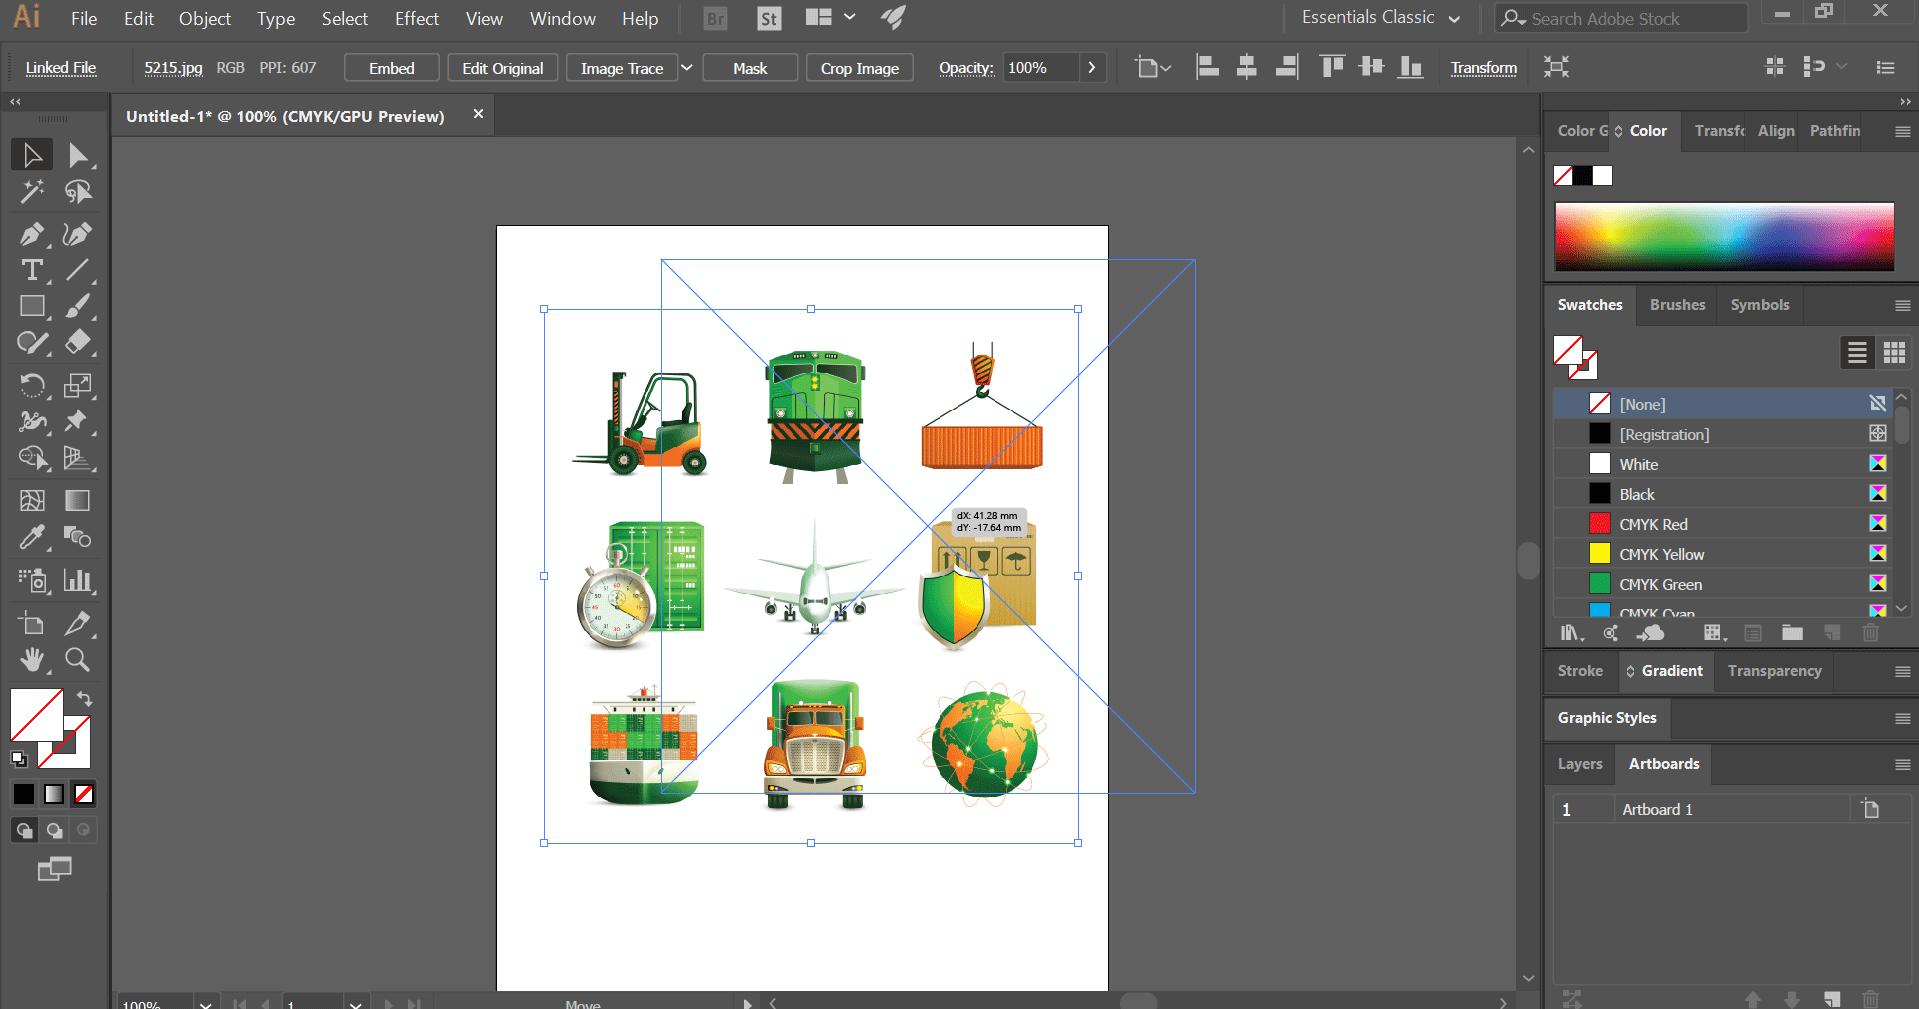 resize image (Insert Image in Illustrator)